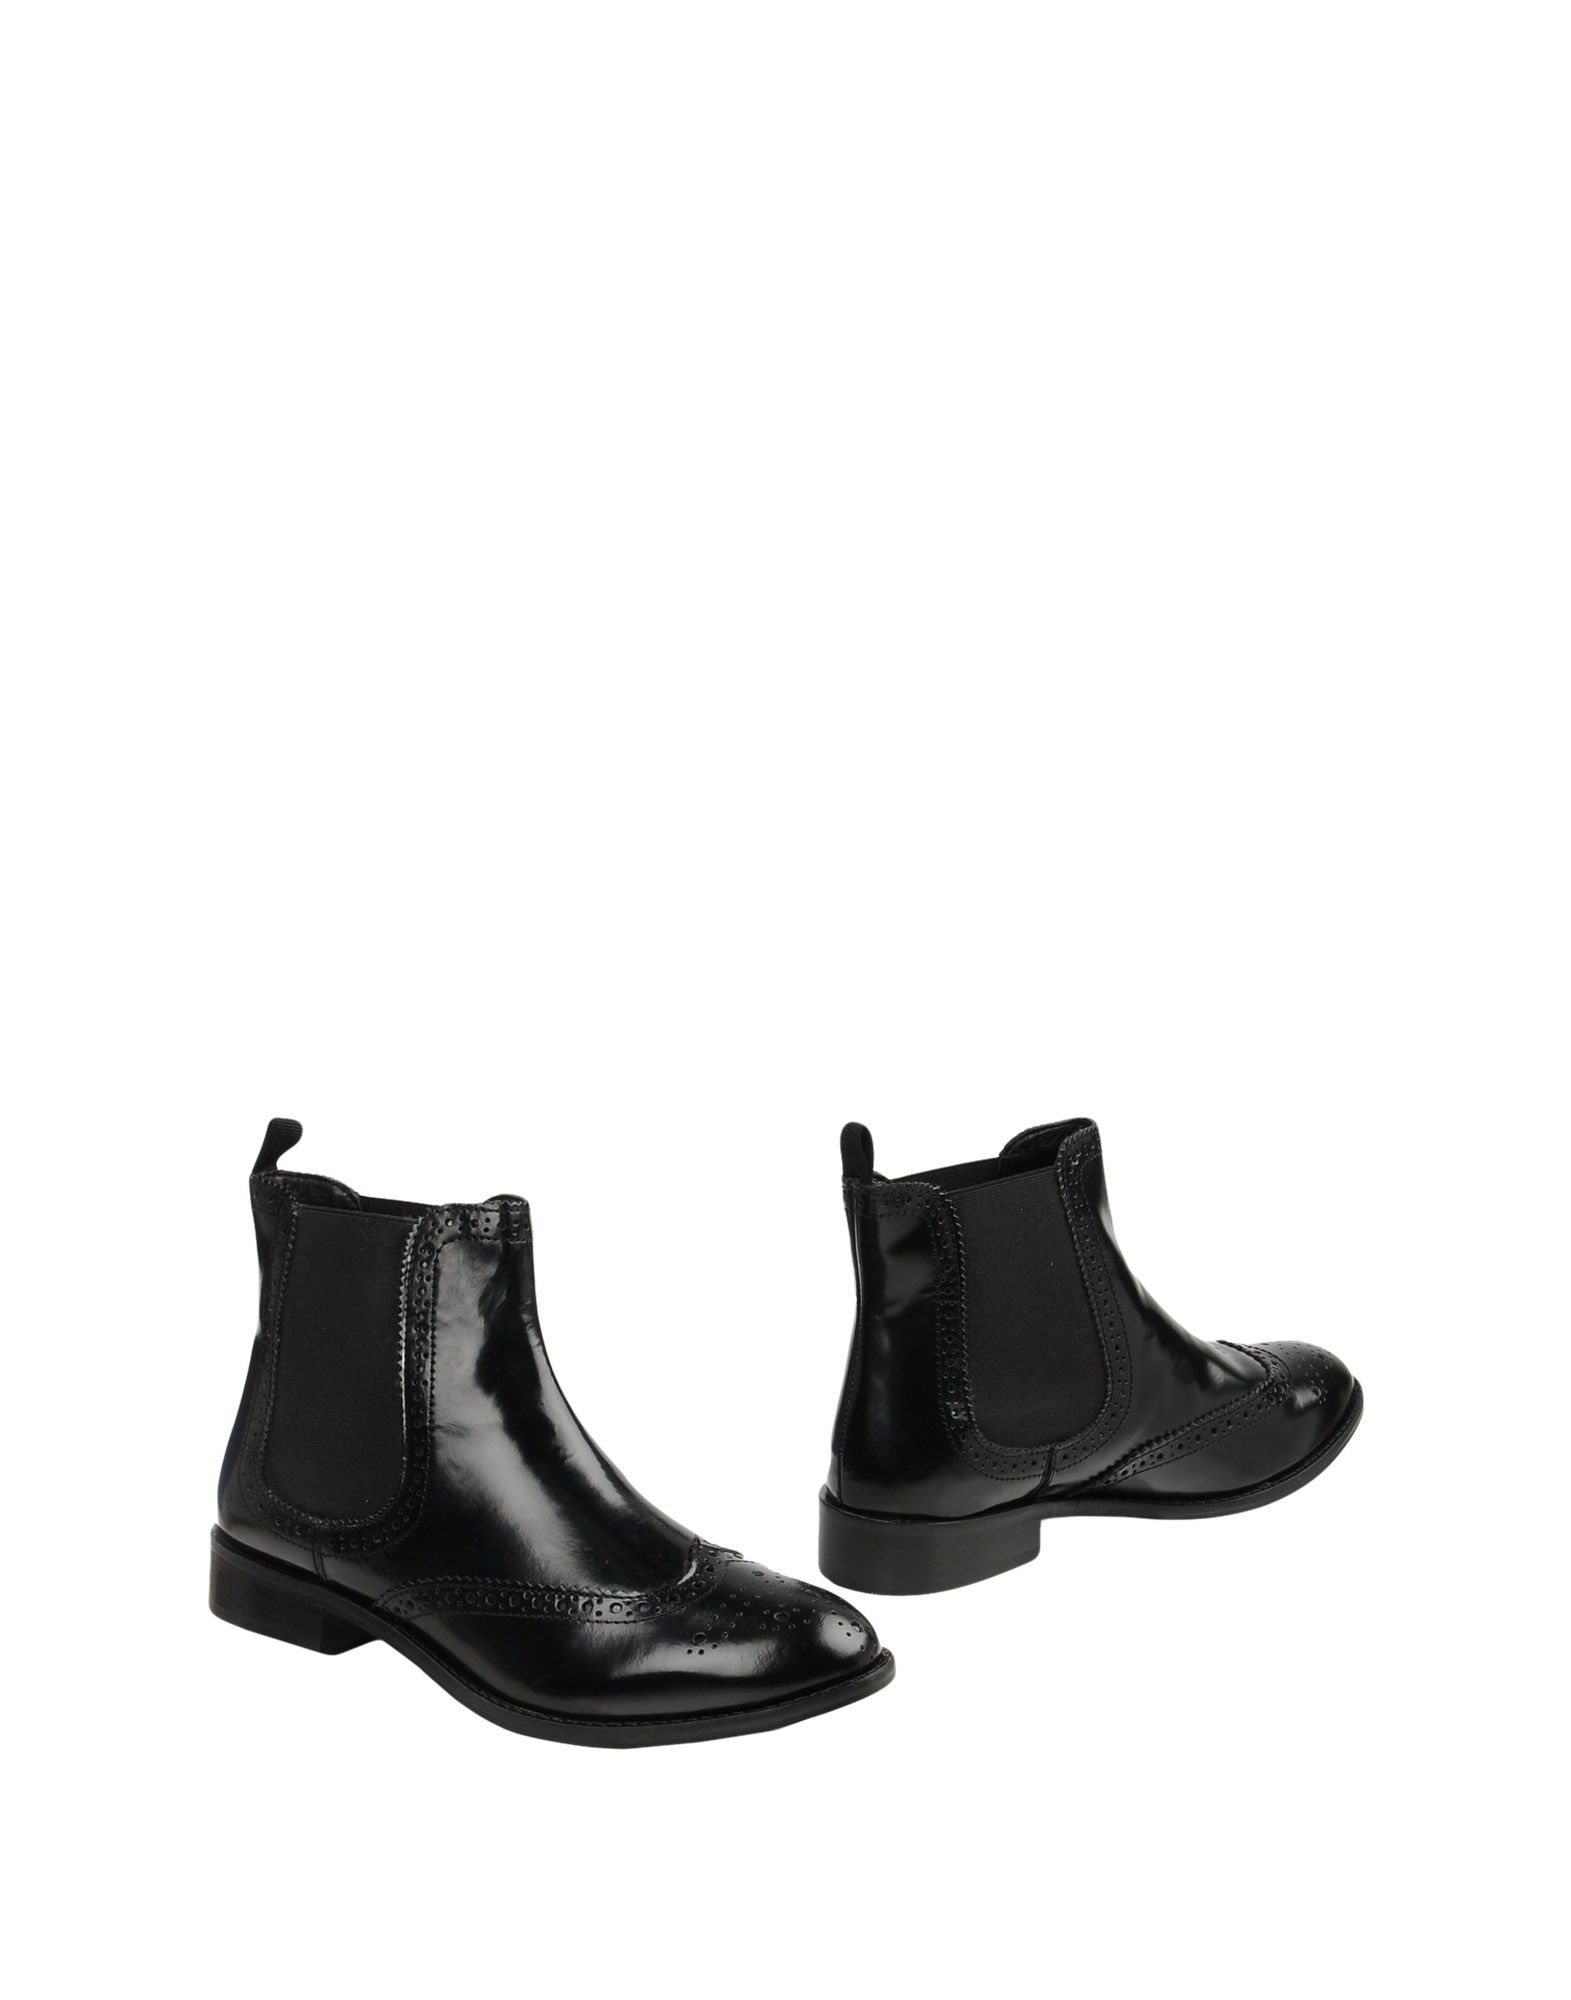 Stilvolle billige Schuhe Dune London Stiefelette Damen  11334912TM